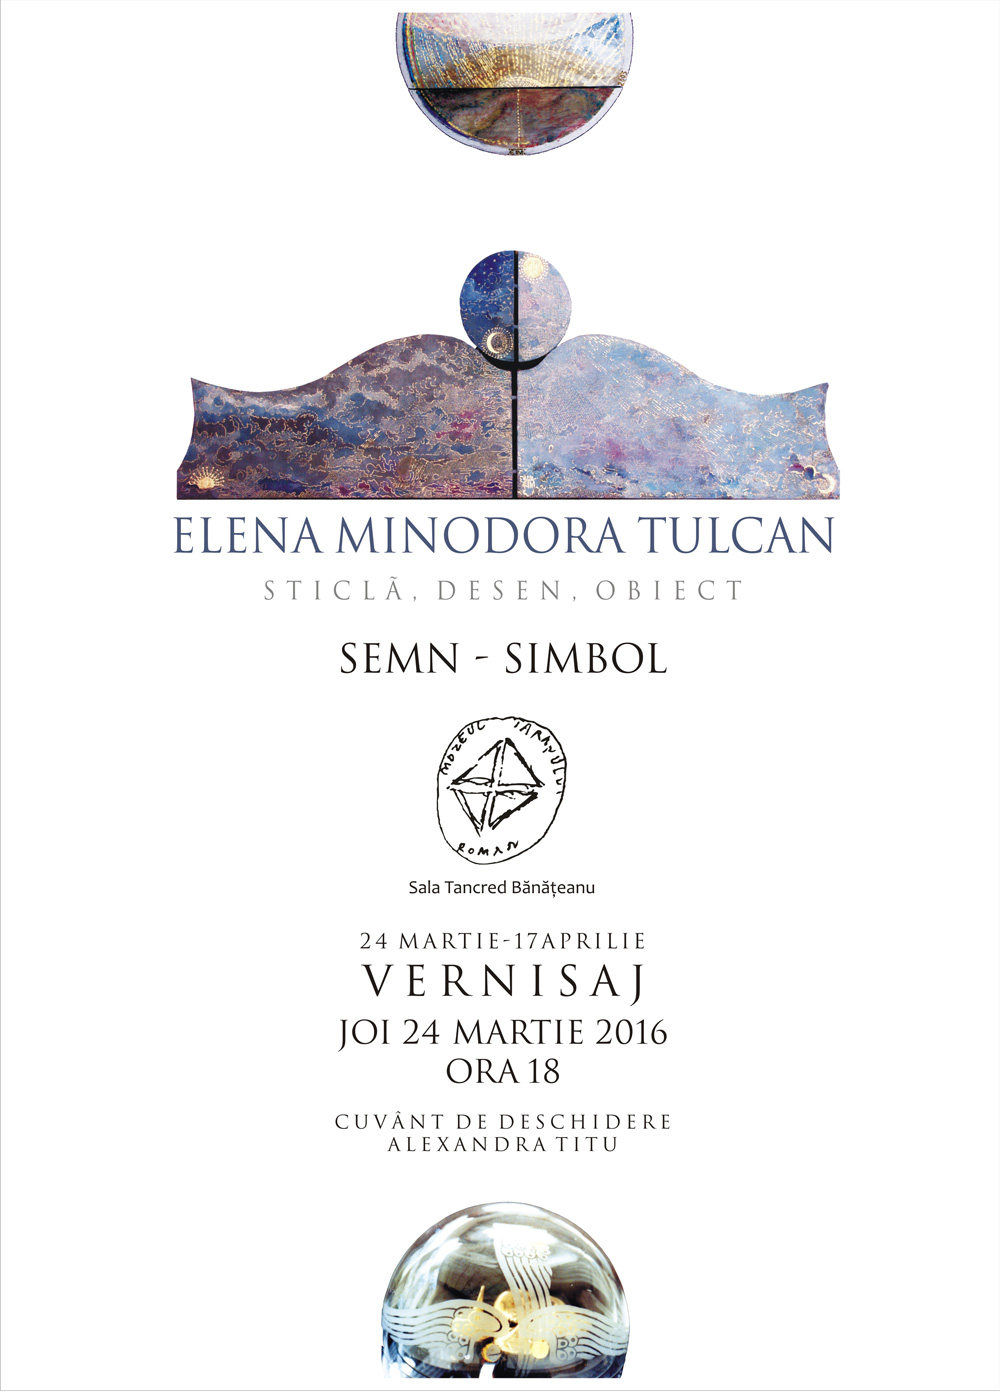 Elena Minodora Tulcan